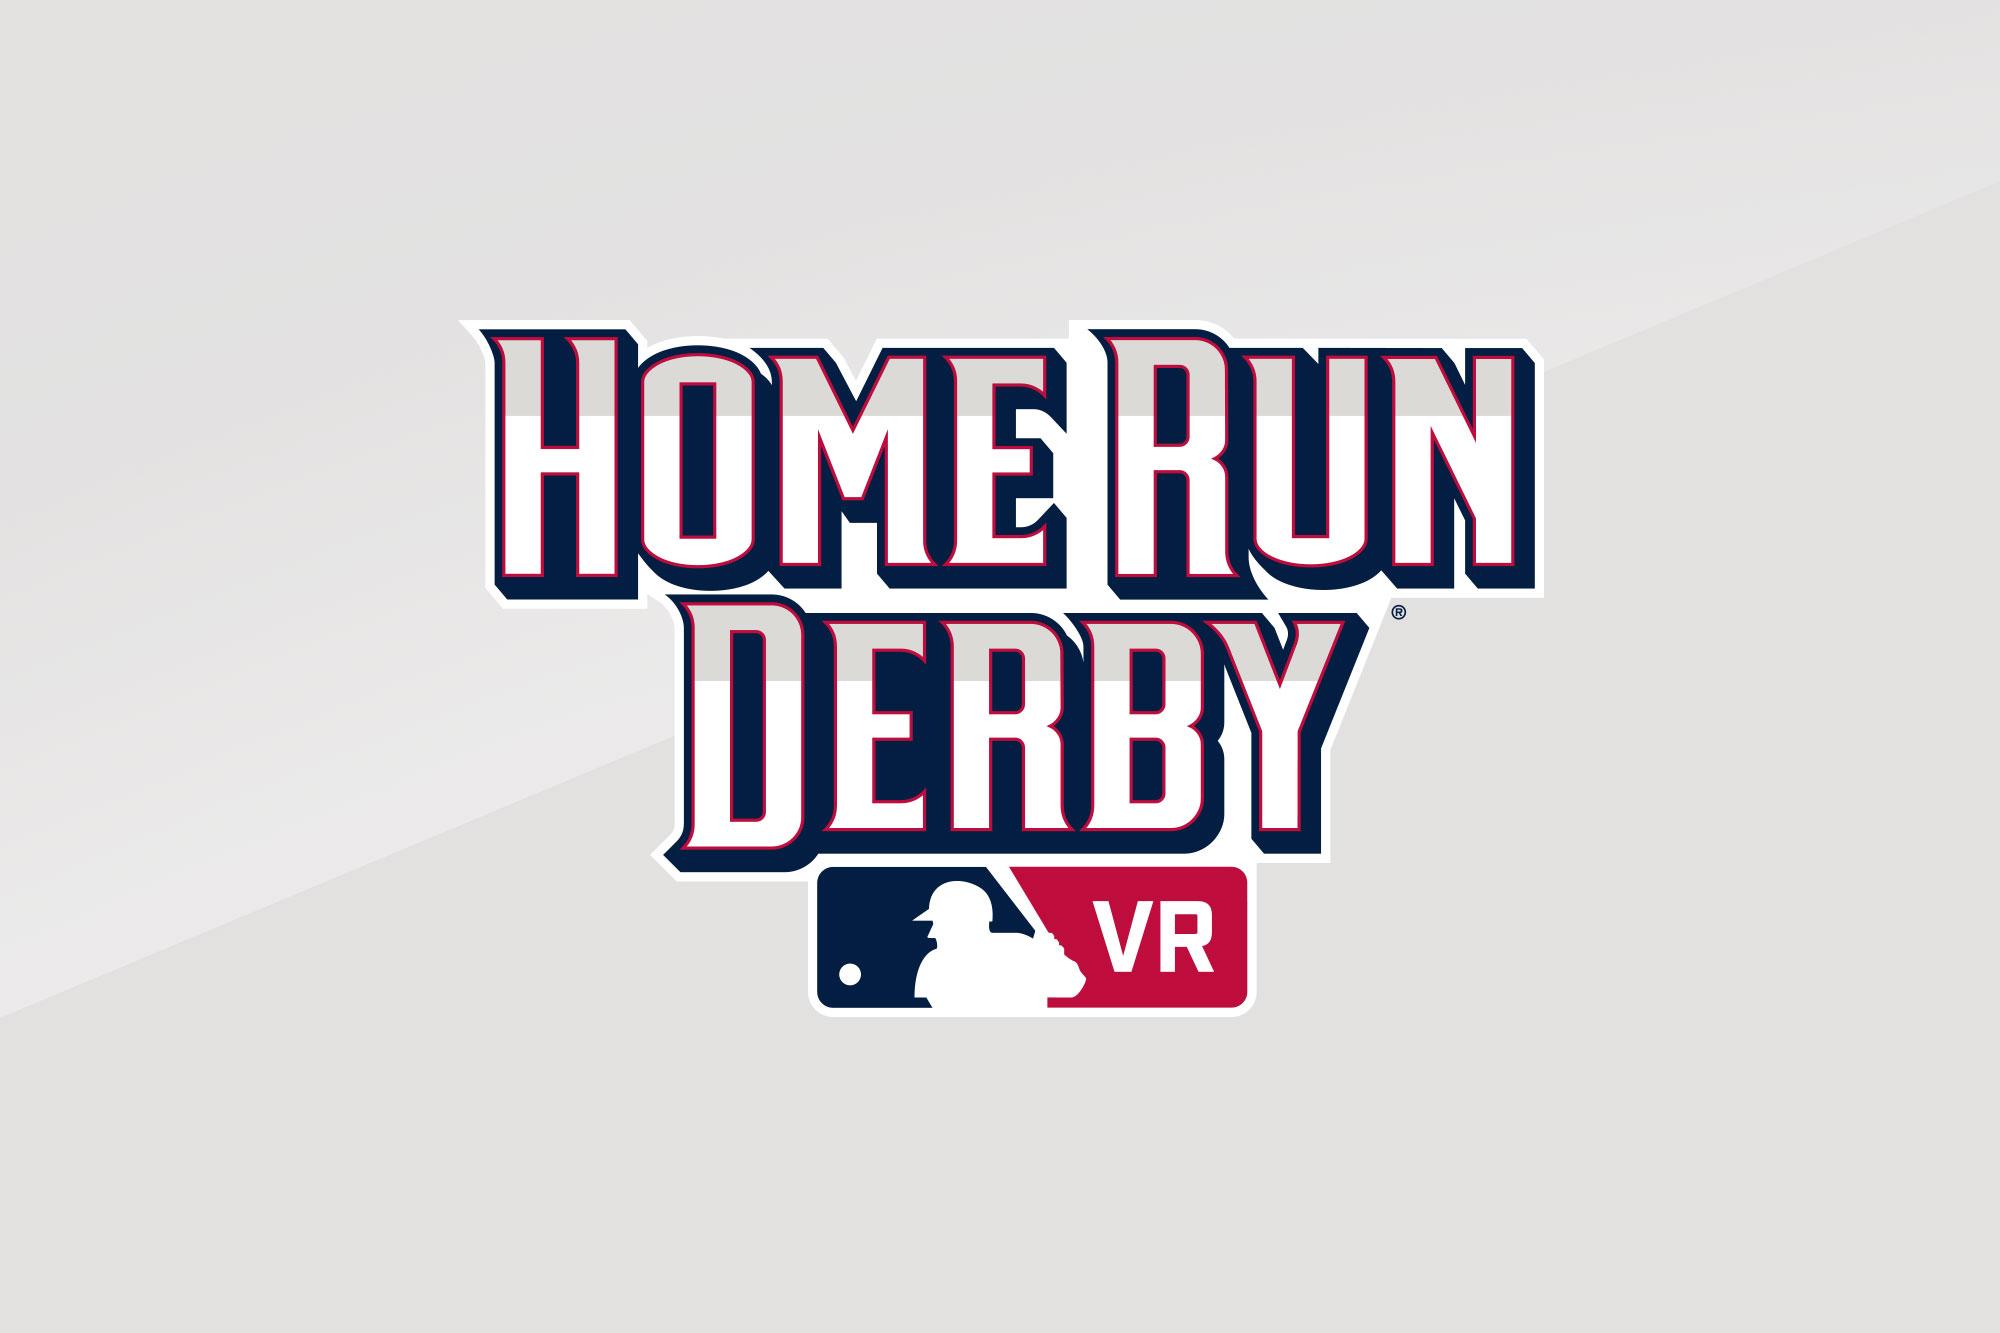 home-run-derby-vr-logo